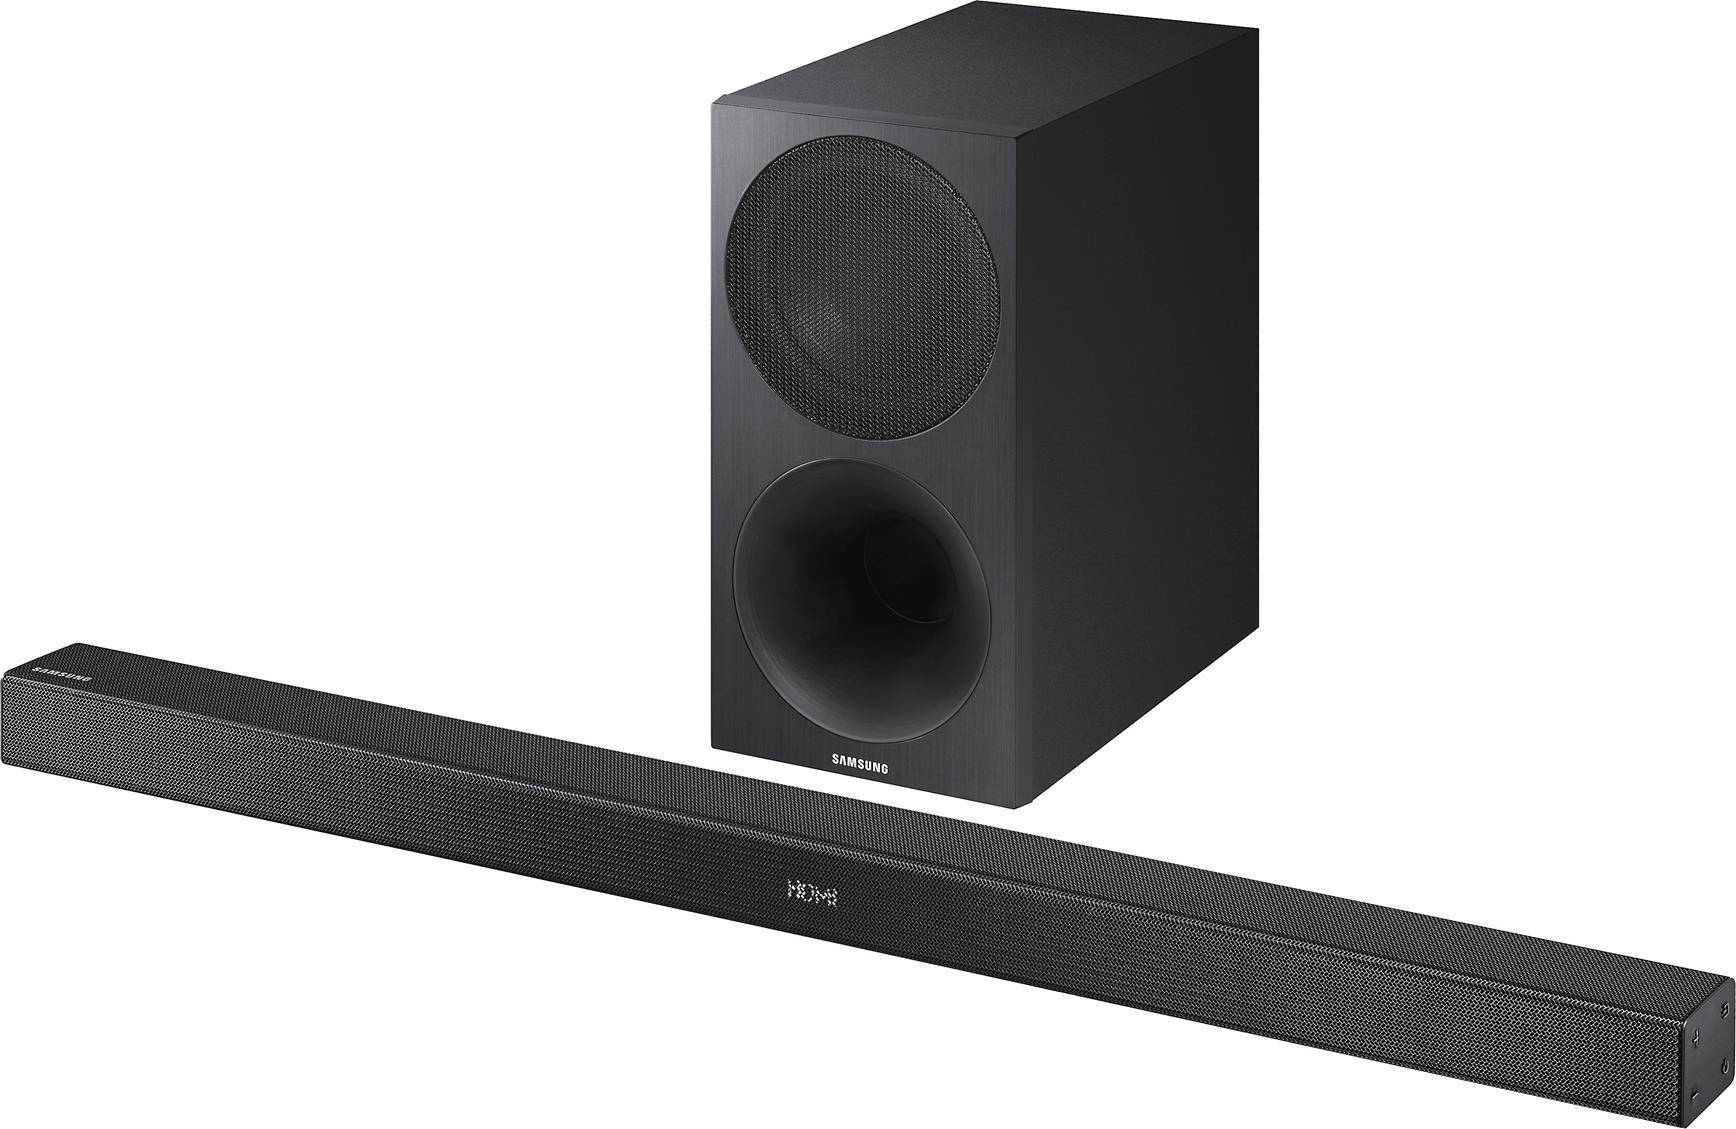 Samsung Hw M450 Soundbar Review Techhive Free Speaker Plans Odd Way Of Wiring Three Speakers To An Amp 1